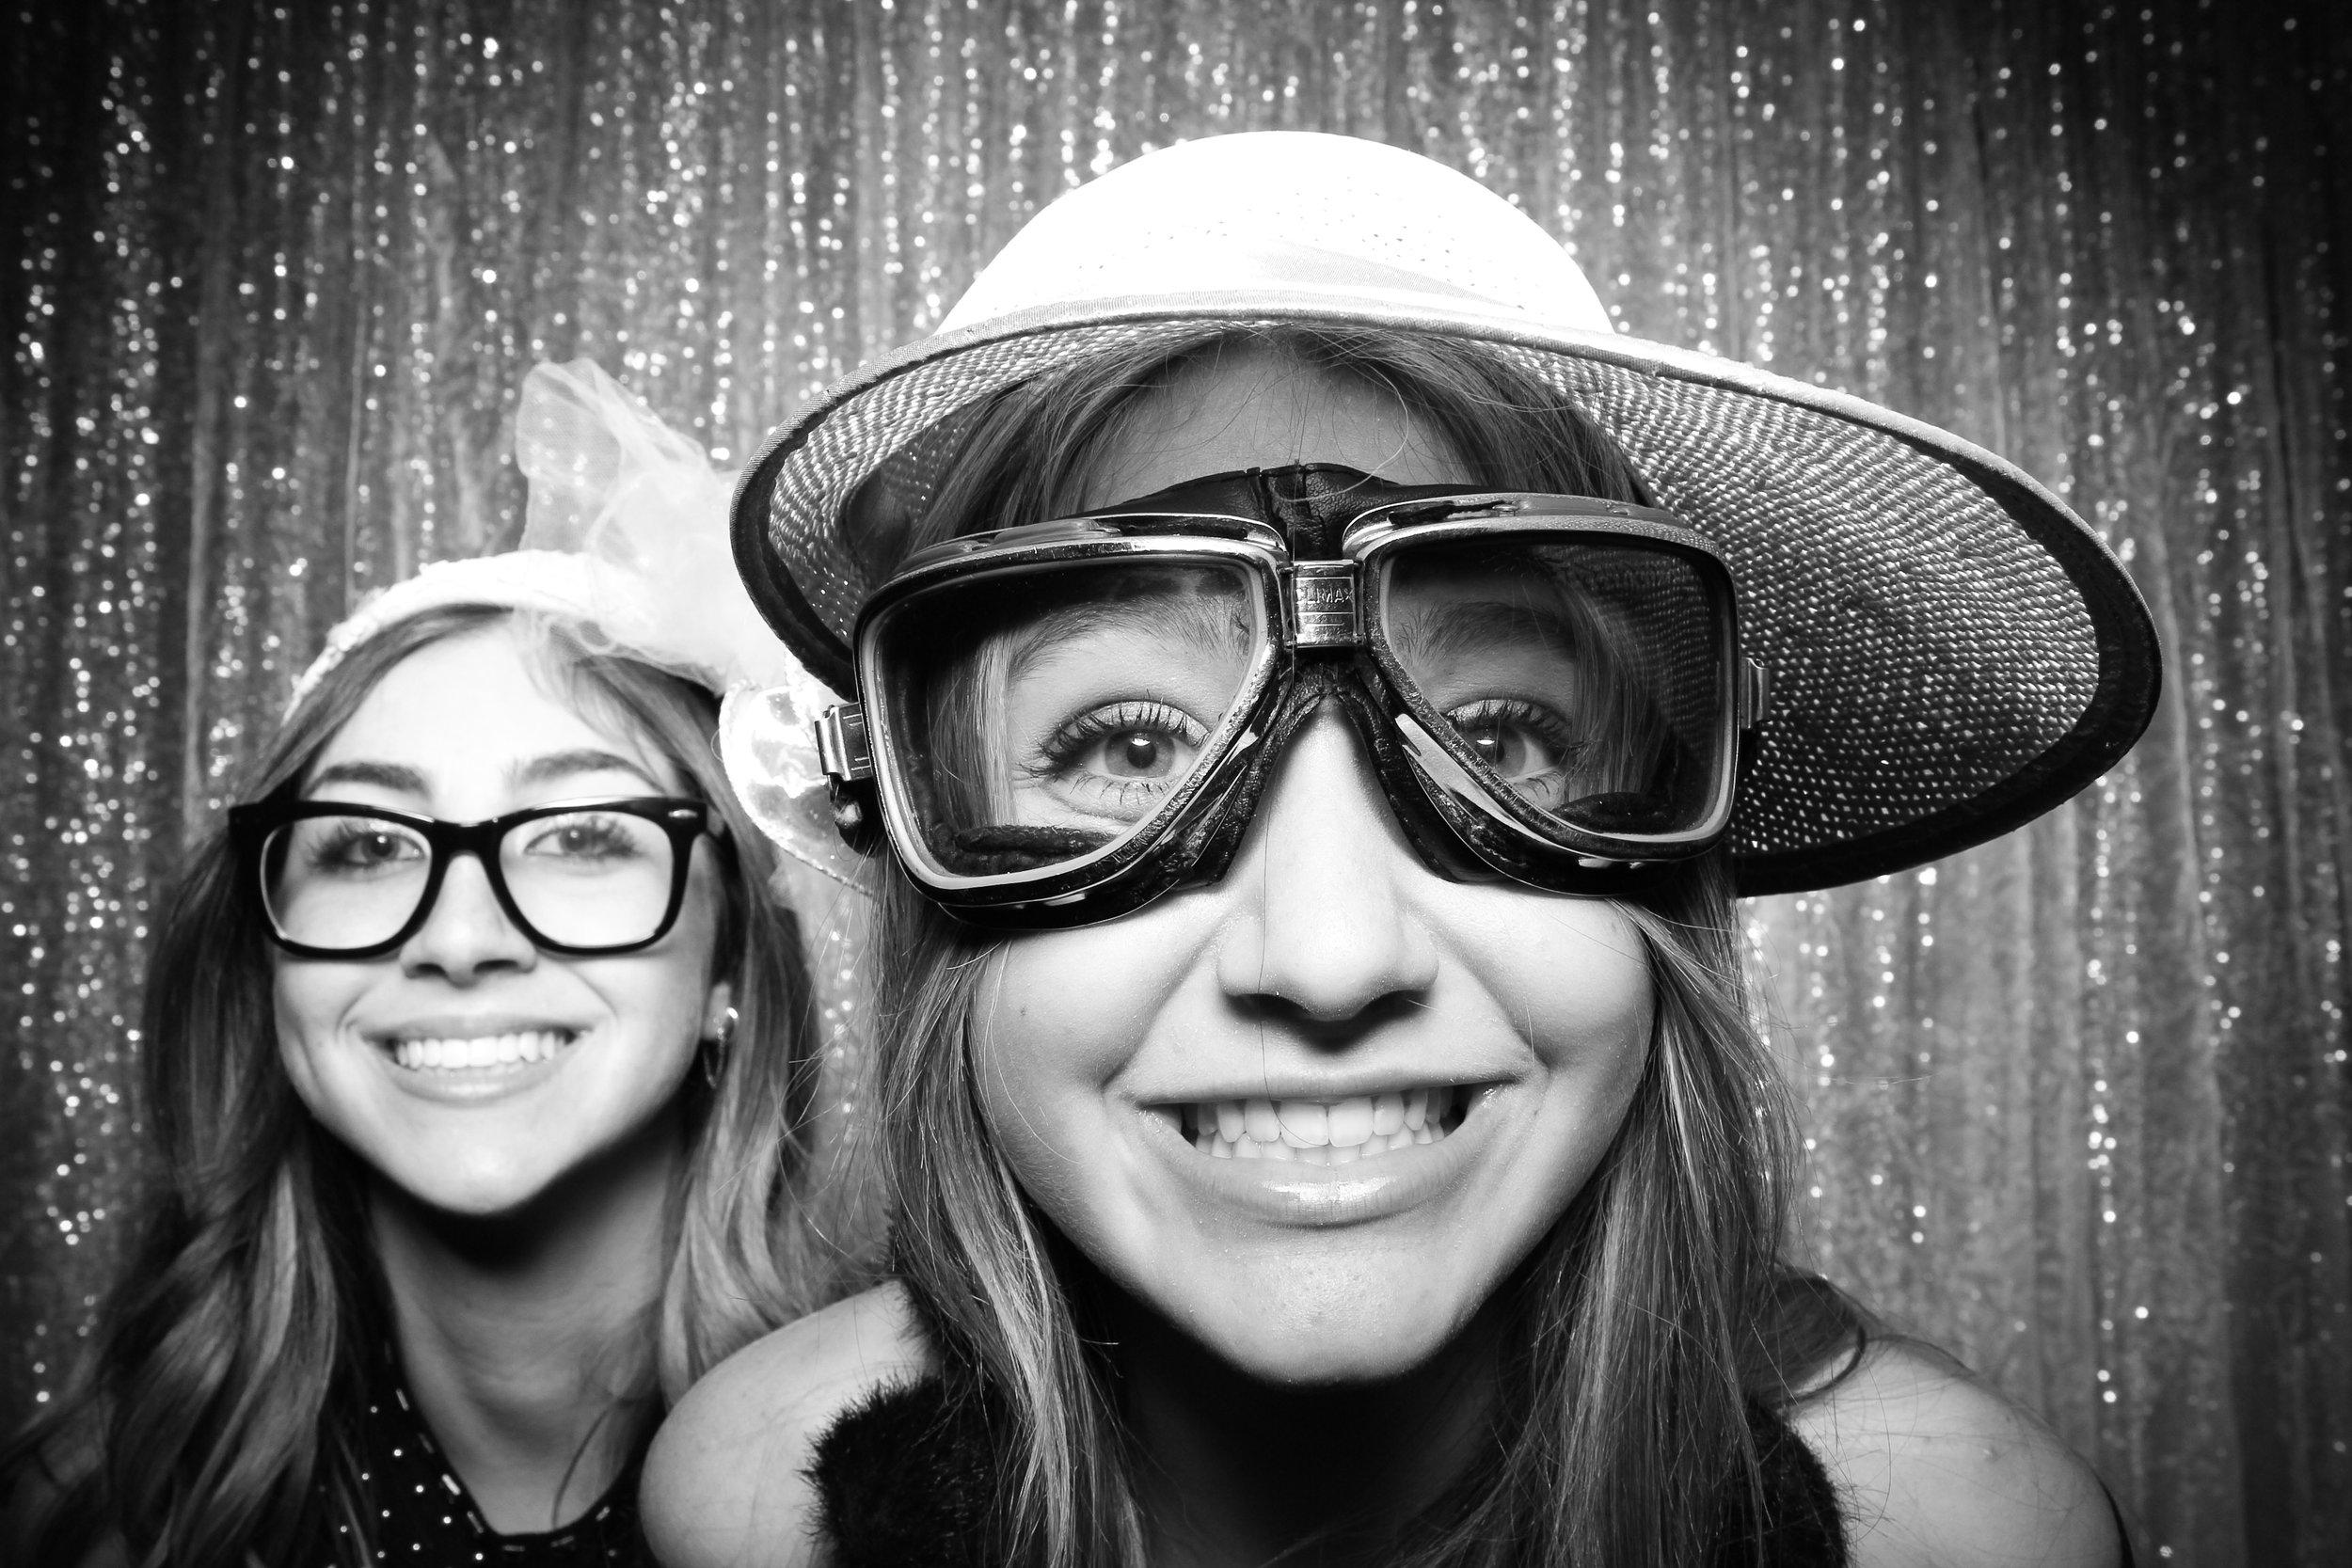 JW_Marriott_Burnham_Ballroom_Wedding_Photo_Booth_02.jpg